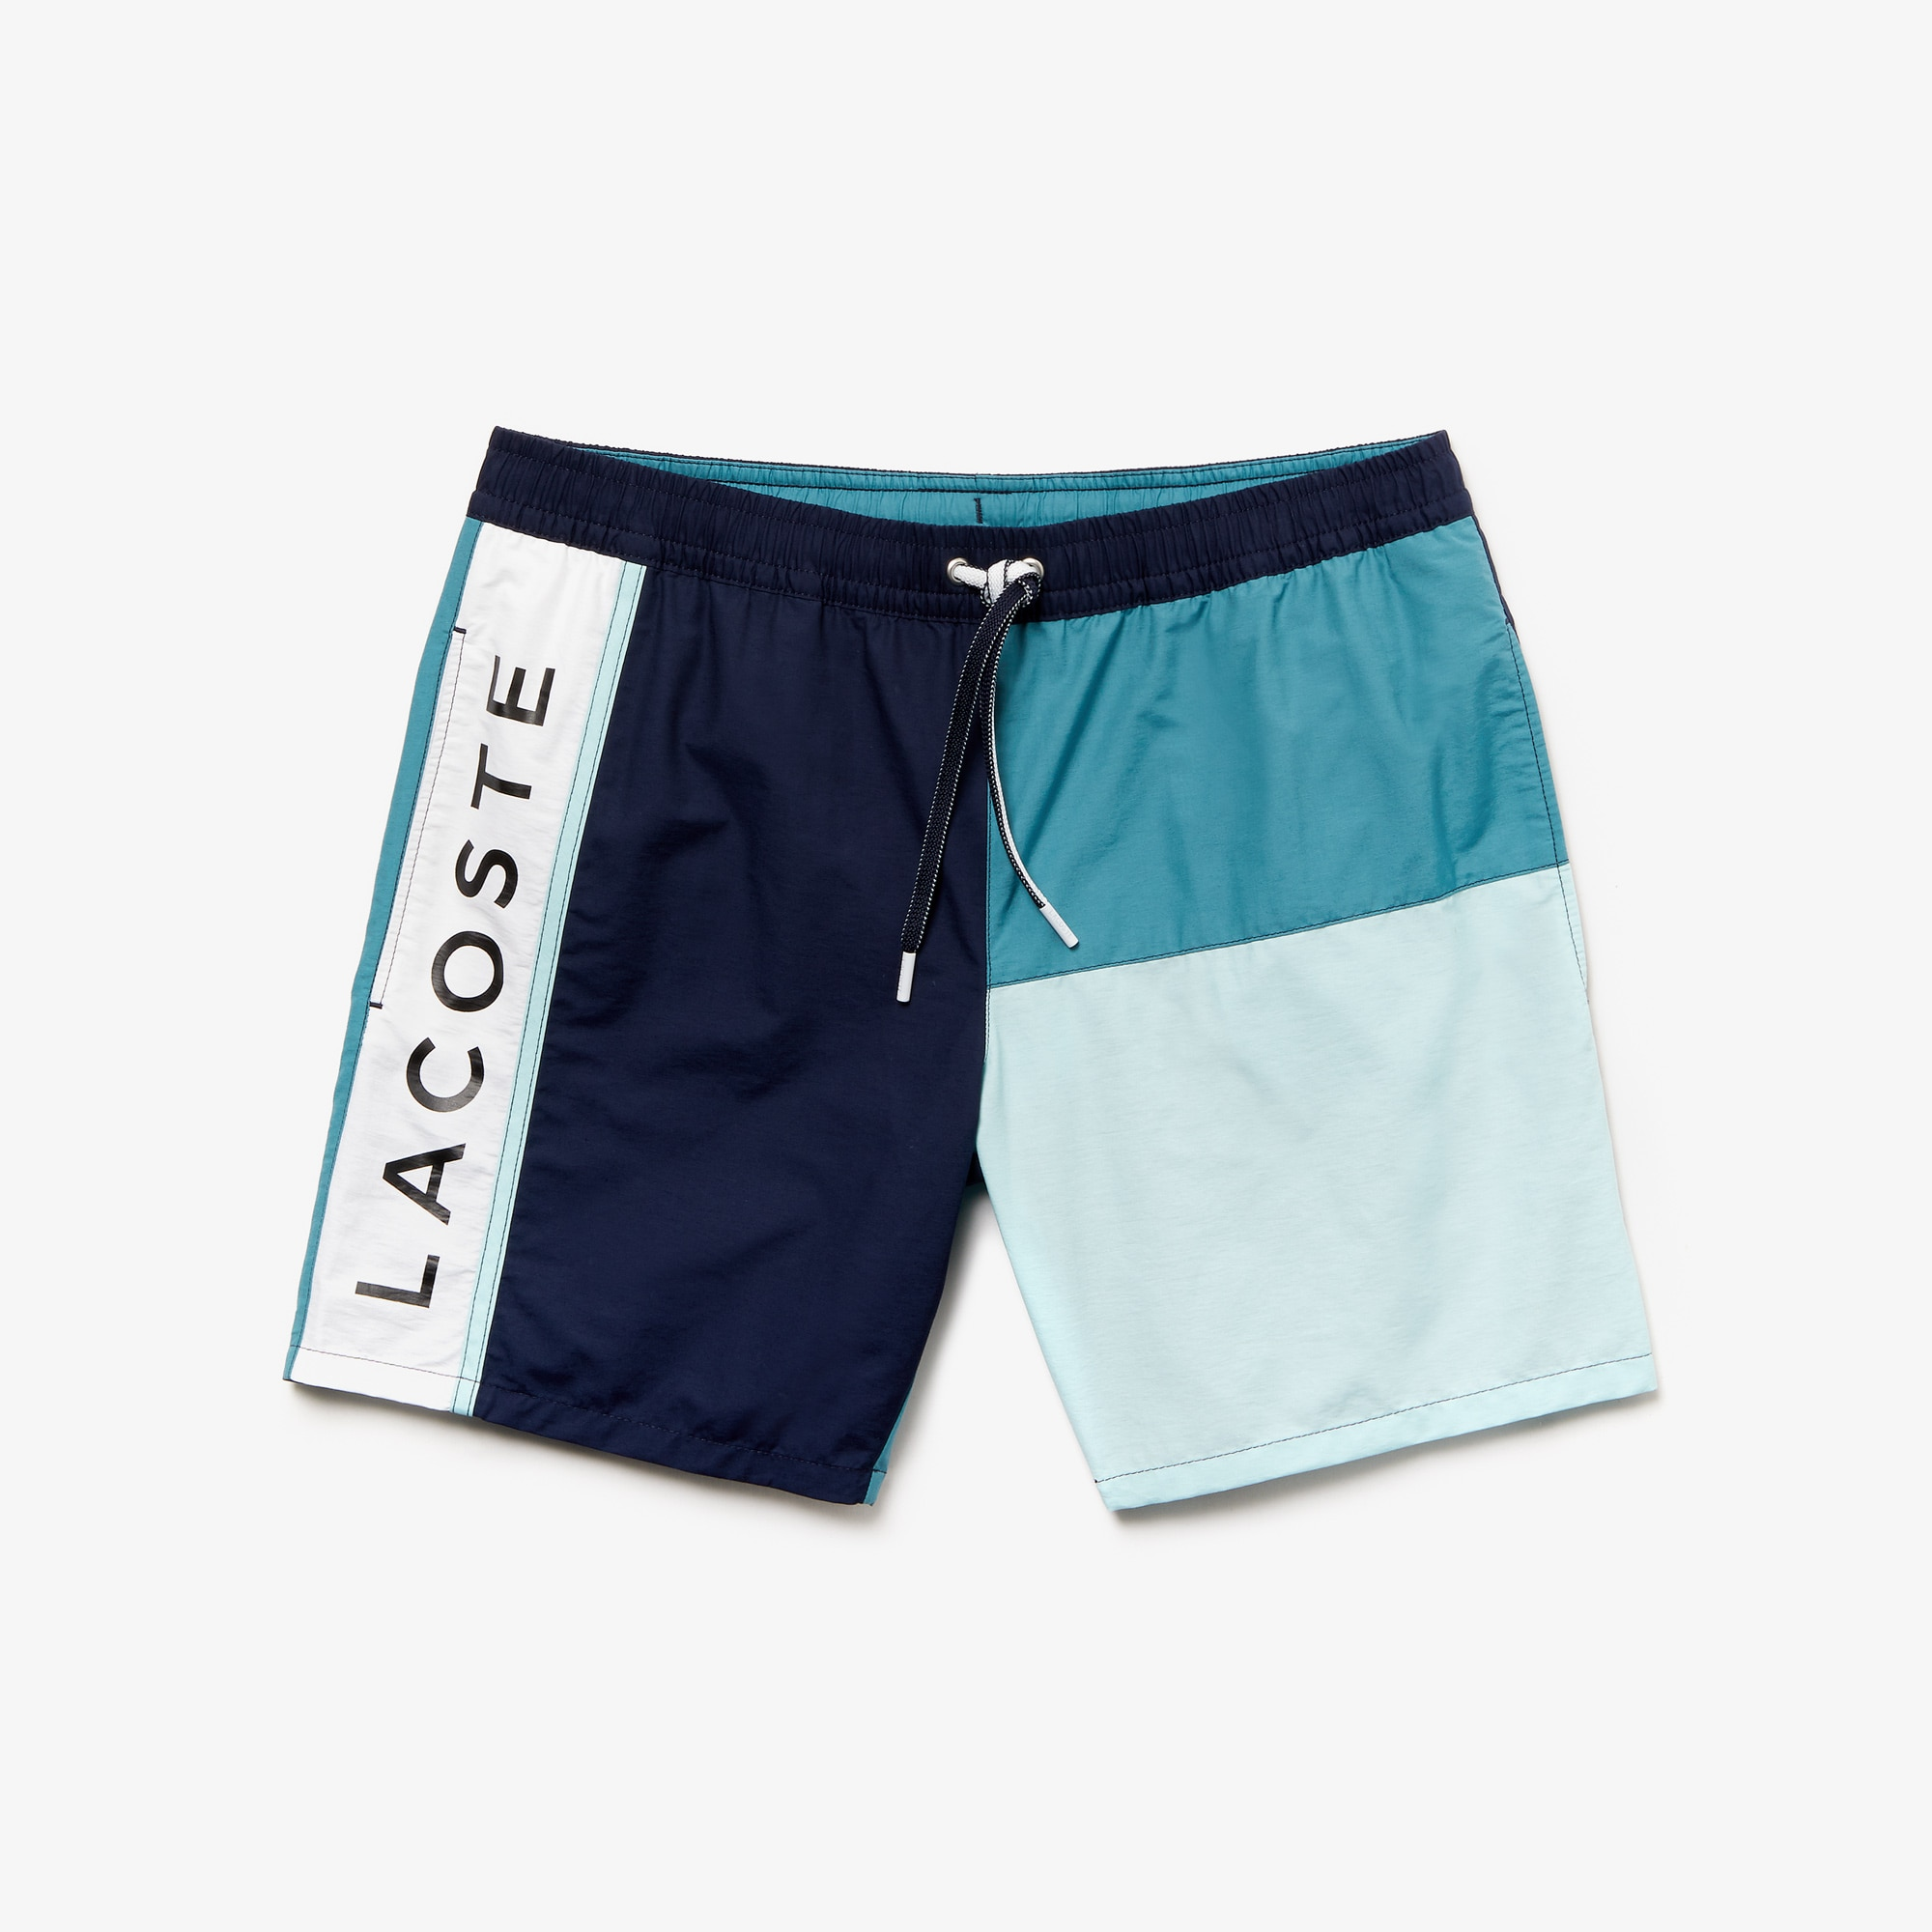 ff30c29f04 Lacoste Mens Striped Taffeta Swim Shorts Blue Sports & Outdoor Clothing